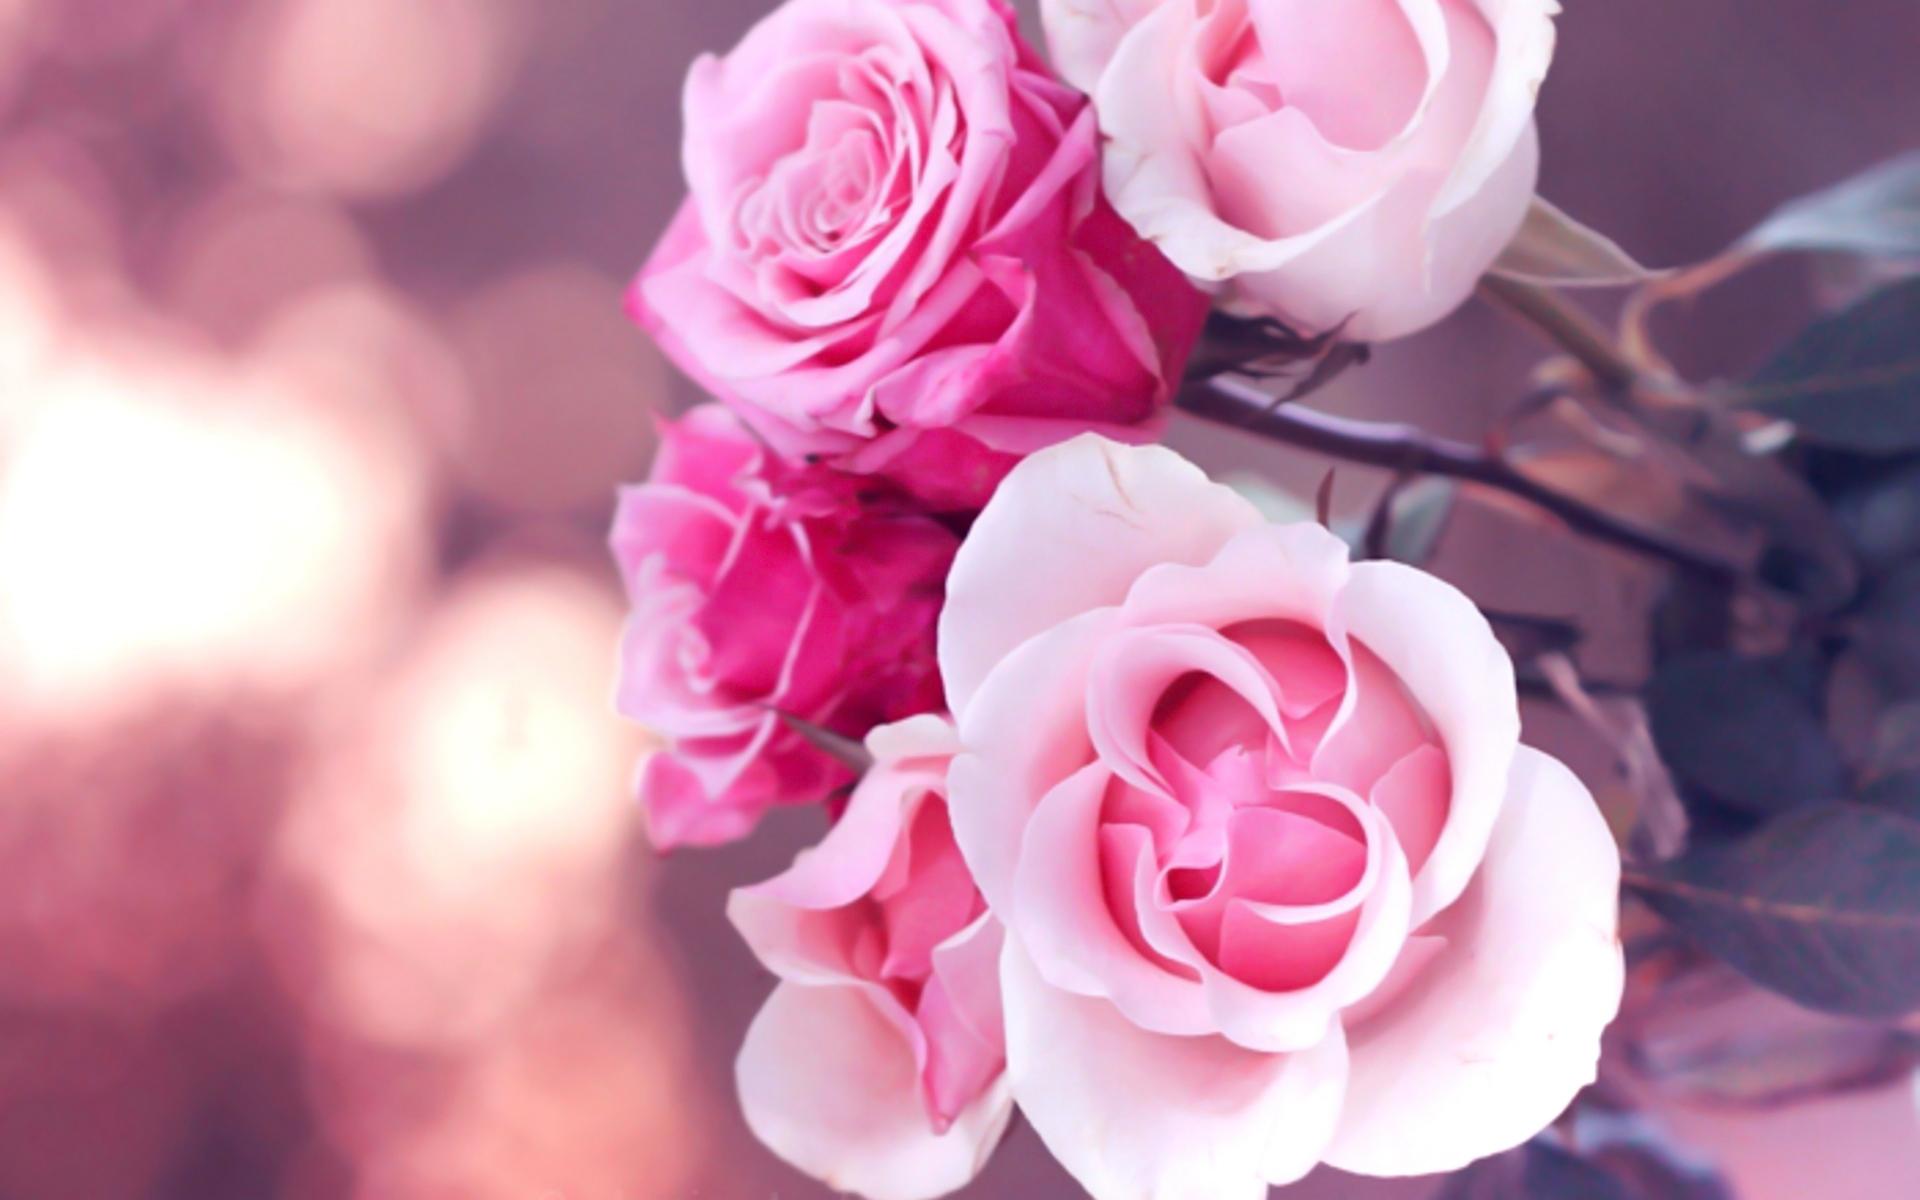 Pink roses wallpapers hd desktop wallpapers 4k hd - Pink roses background hd ...